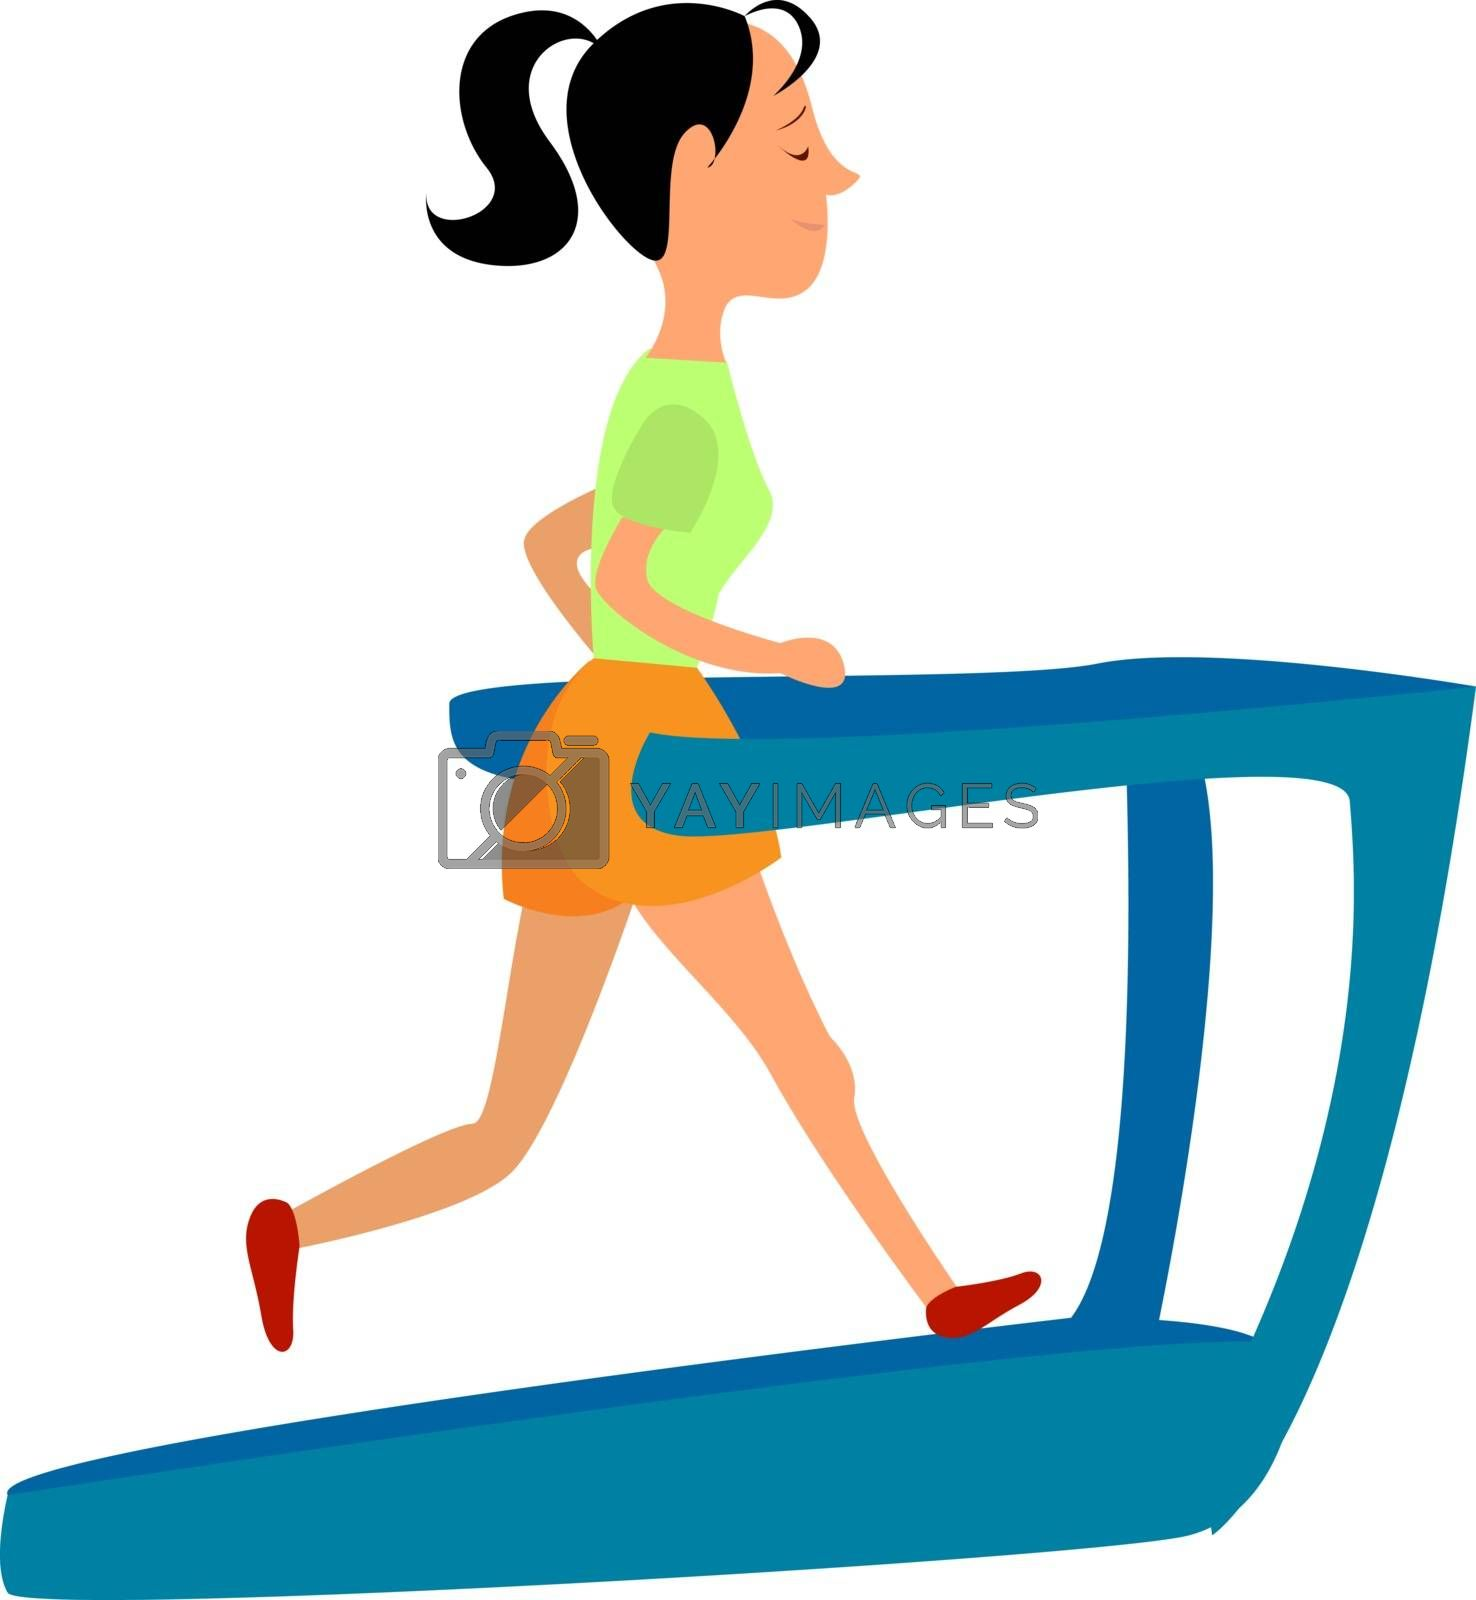 Treadmill, illustration, vector on white background.